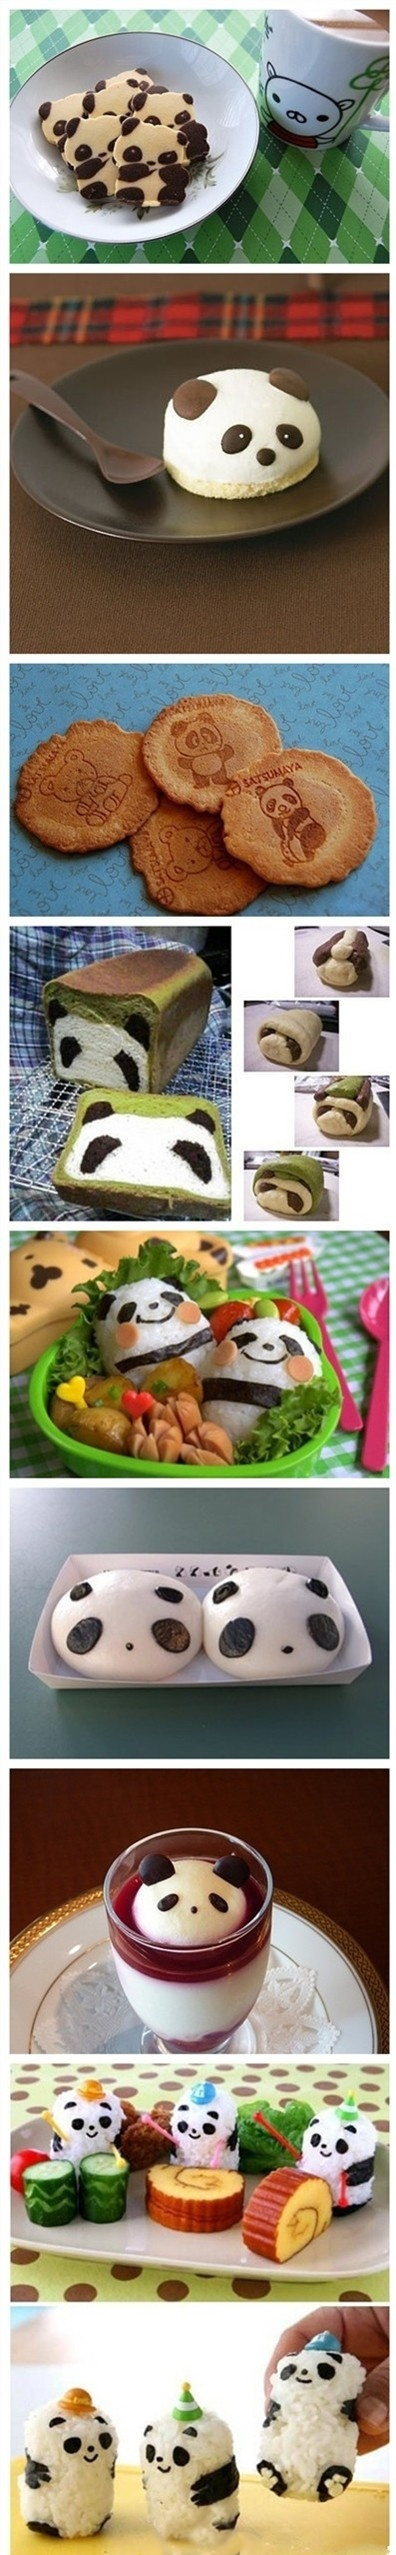 all panda #panda I NEED ALL OF THESE